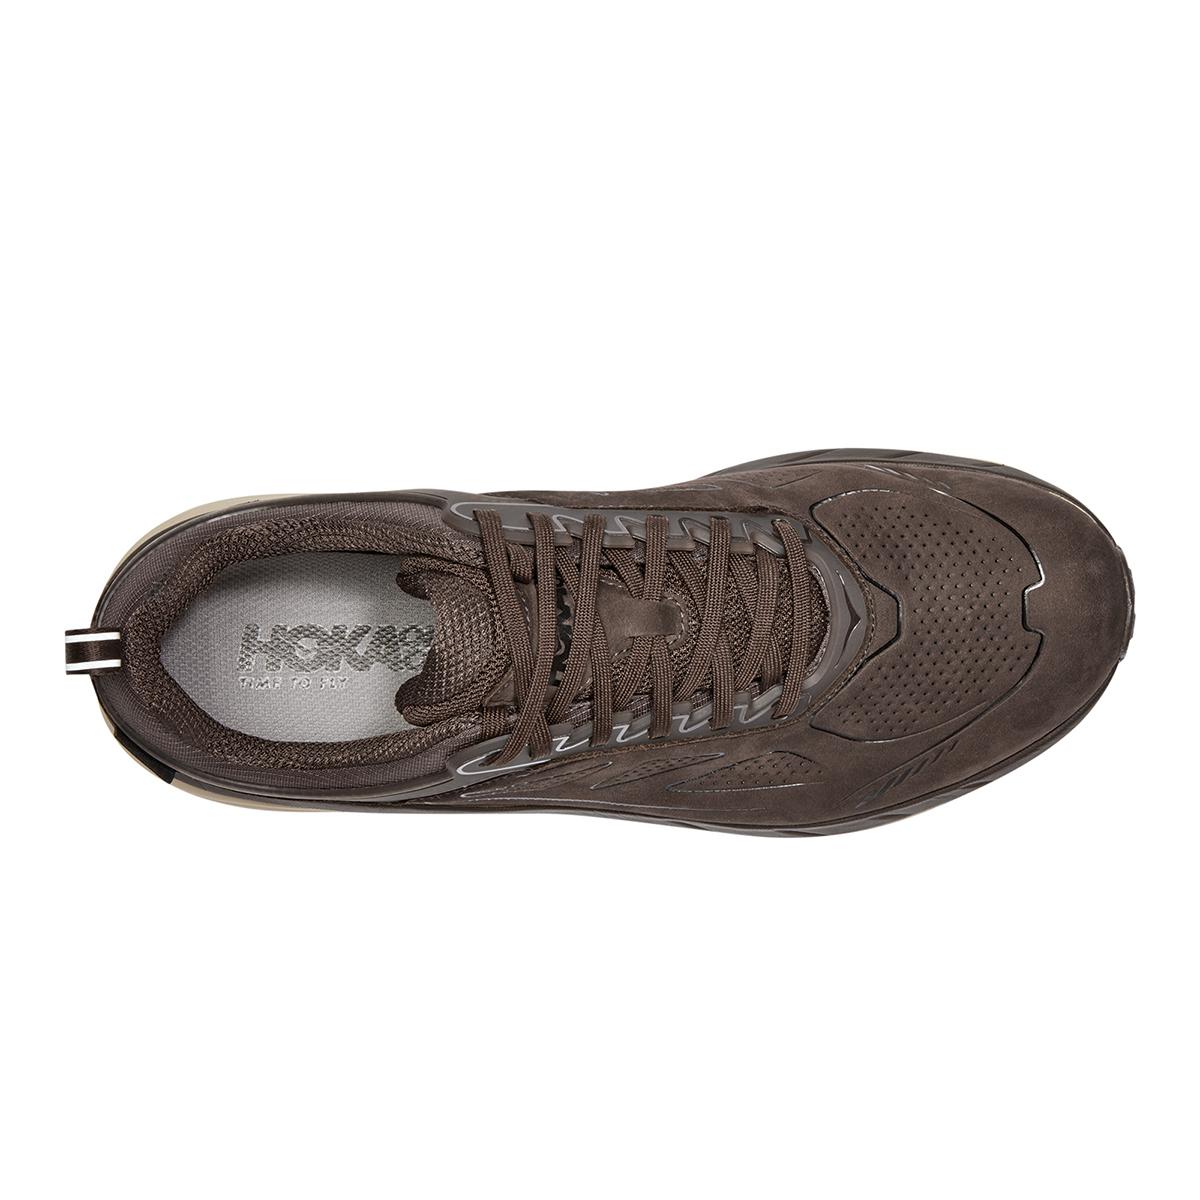 Men's Hoka One One Challenger Low Gore-Tex Trail Running Shoe - Color: Demitasse - Size: 7 - Width: Regular, Demitasse, large, image 3